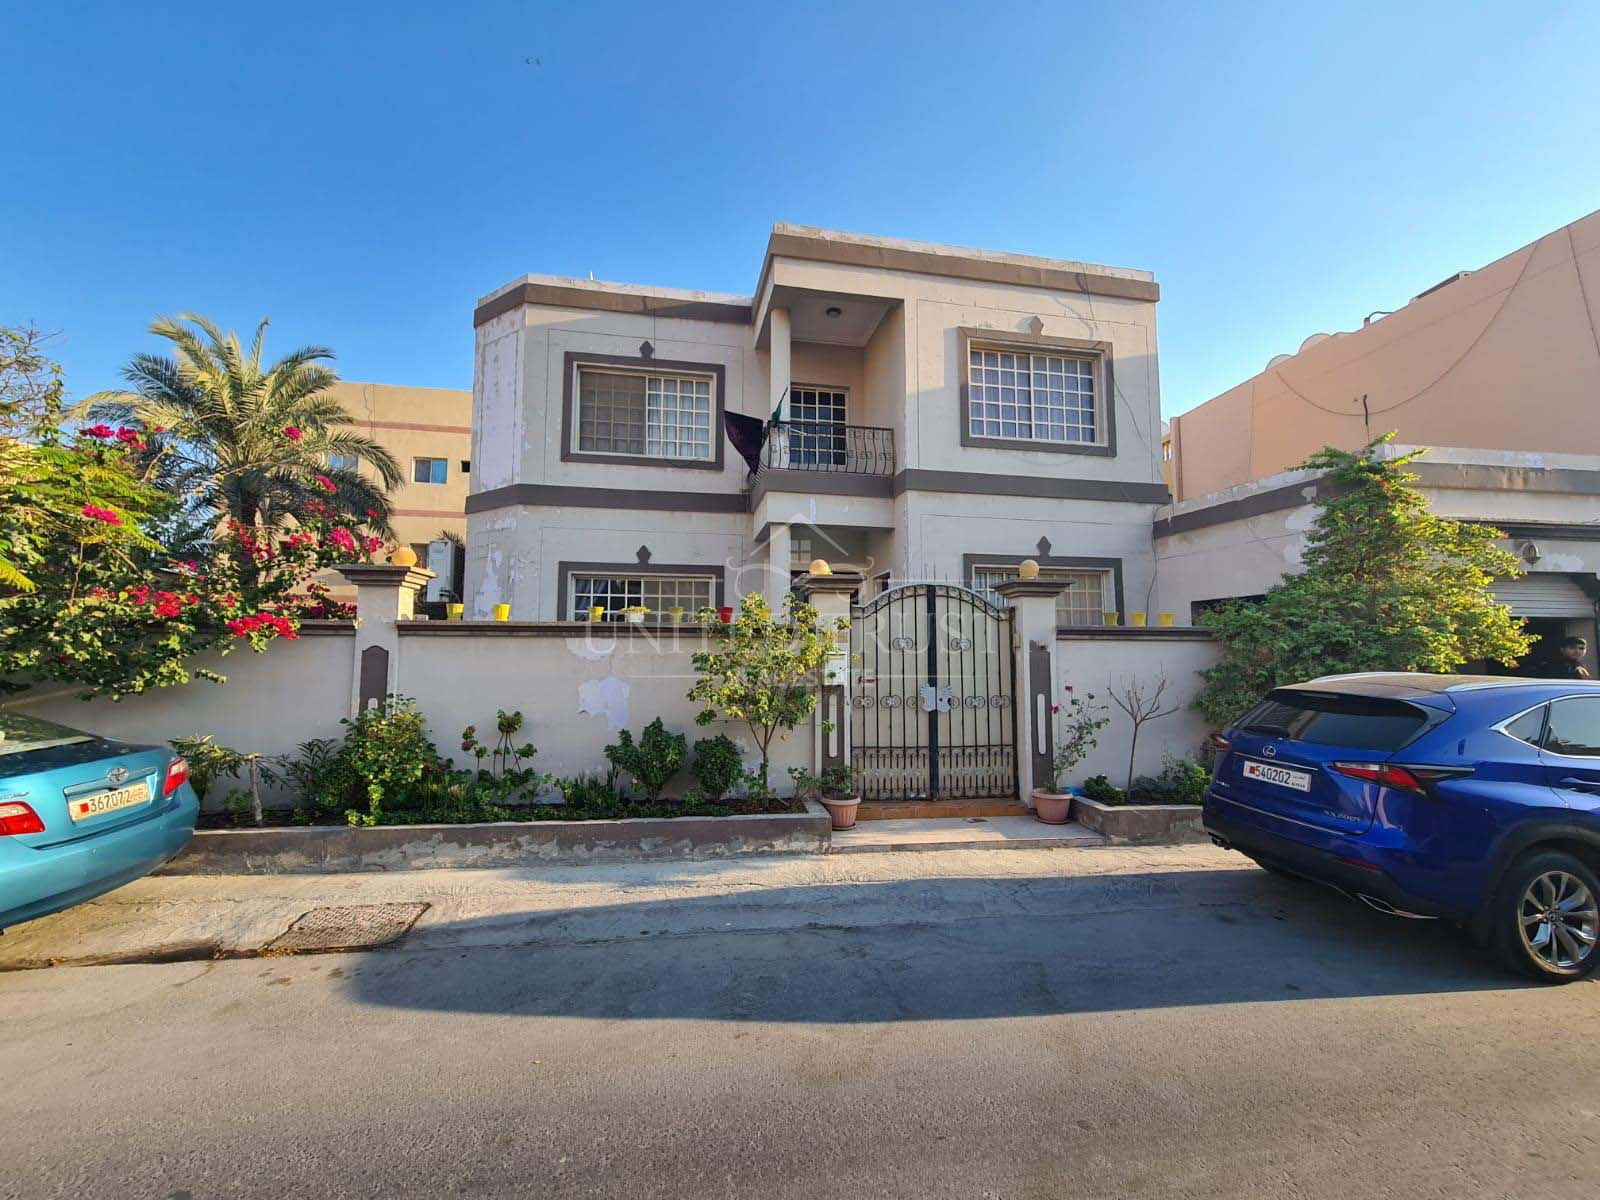 Villa for Sale in Jurdab. Ref: JUR-MN-002